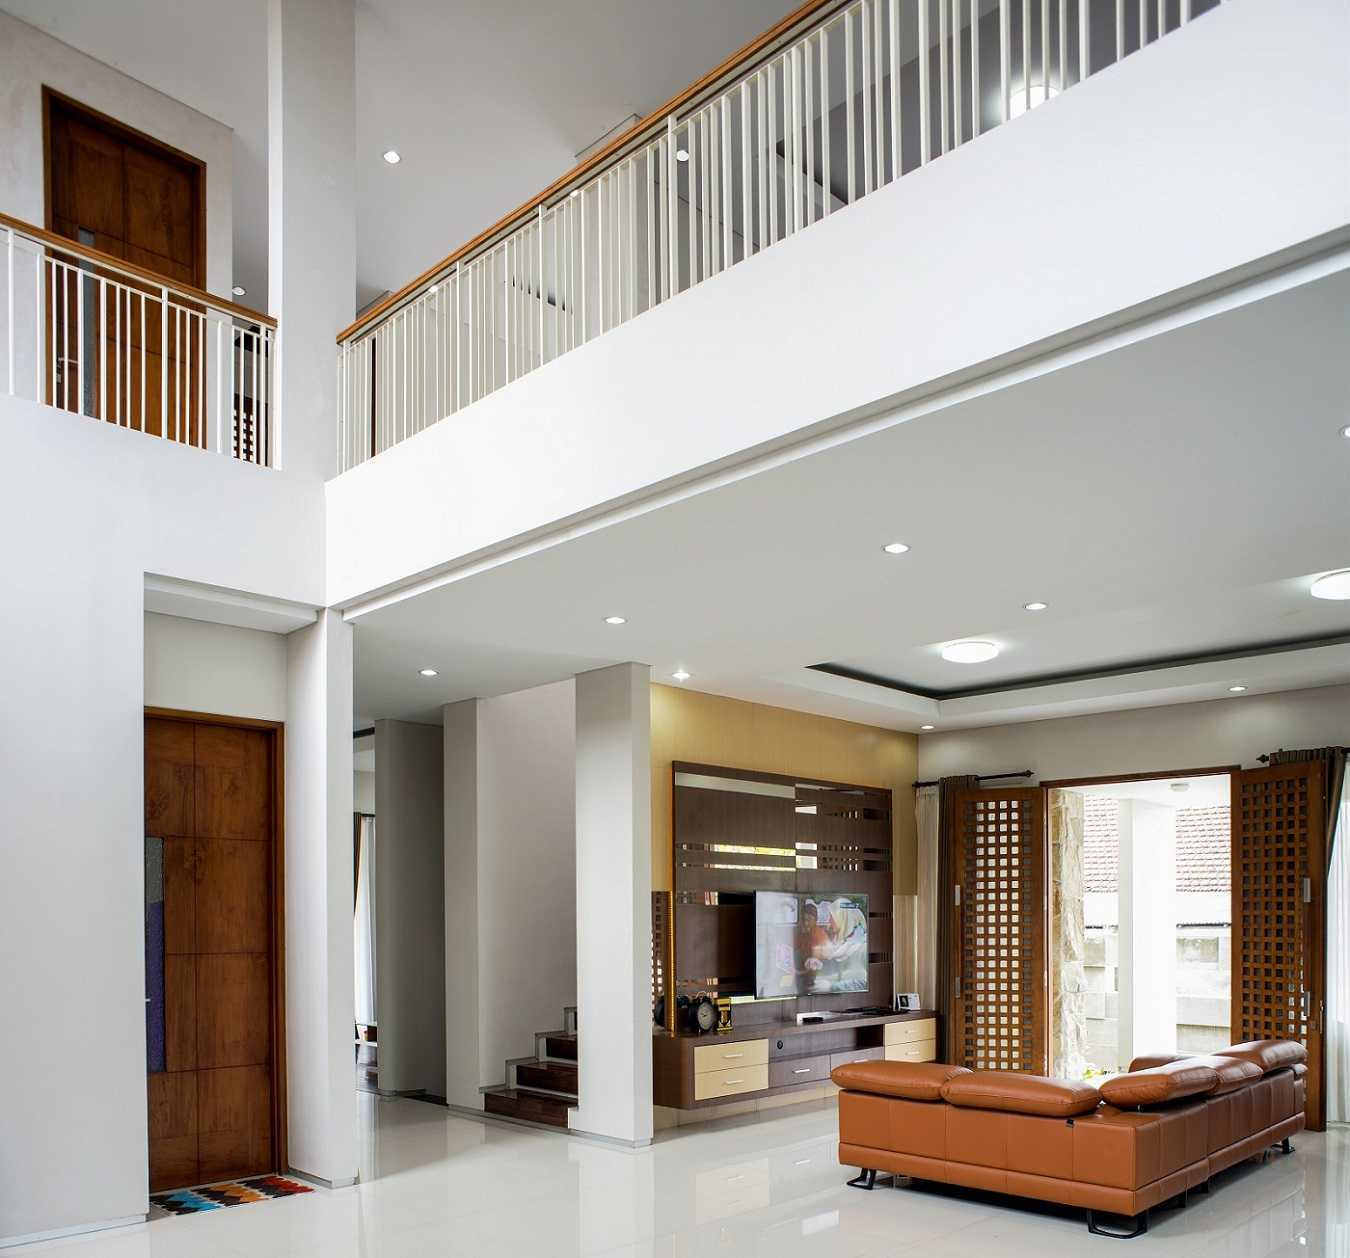 Satuvista Architect Rumah Tropis Hook Kabupaten Jombang, Jawa Timur, Indonesia Jawa Timur, Indonesia Family Room  48717